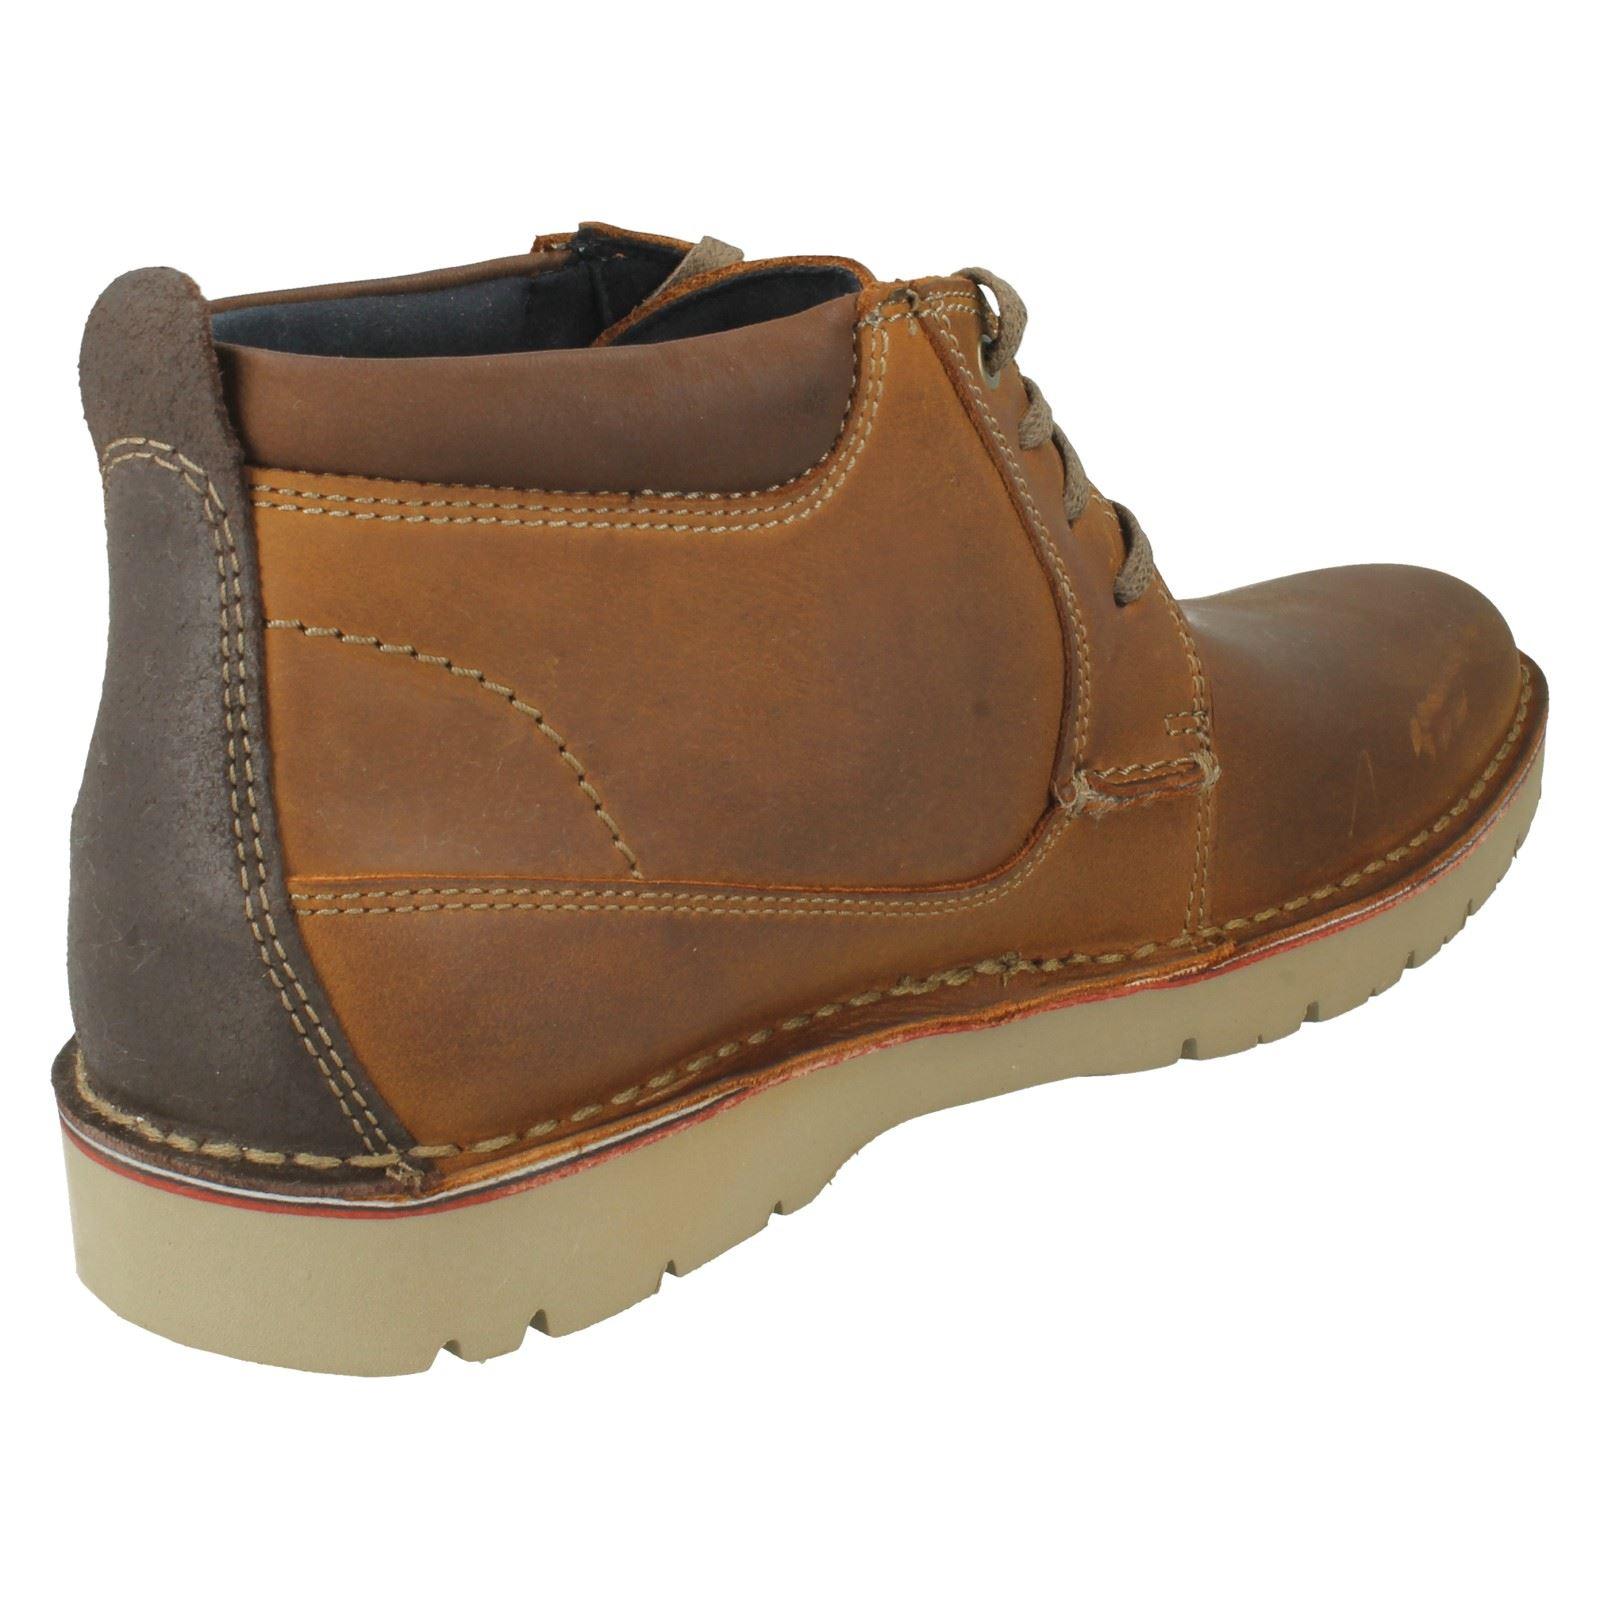 Herren Clarks - Leder Lace Up Ankle Stiefel Style - Clarks Vargo Mid 9037e3